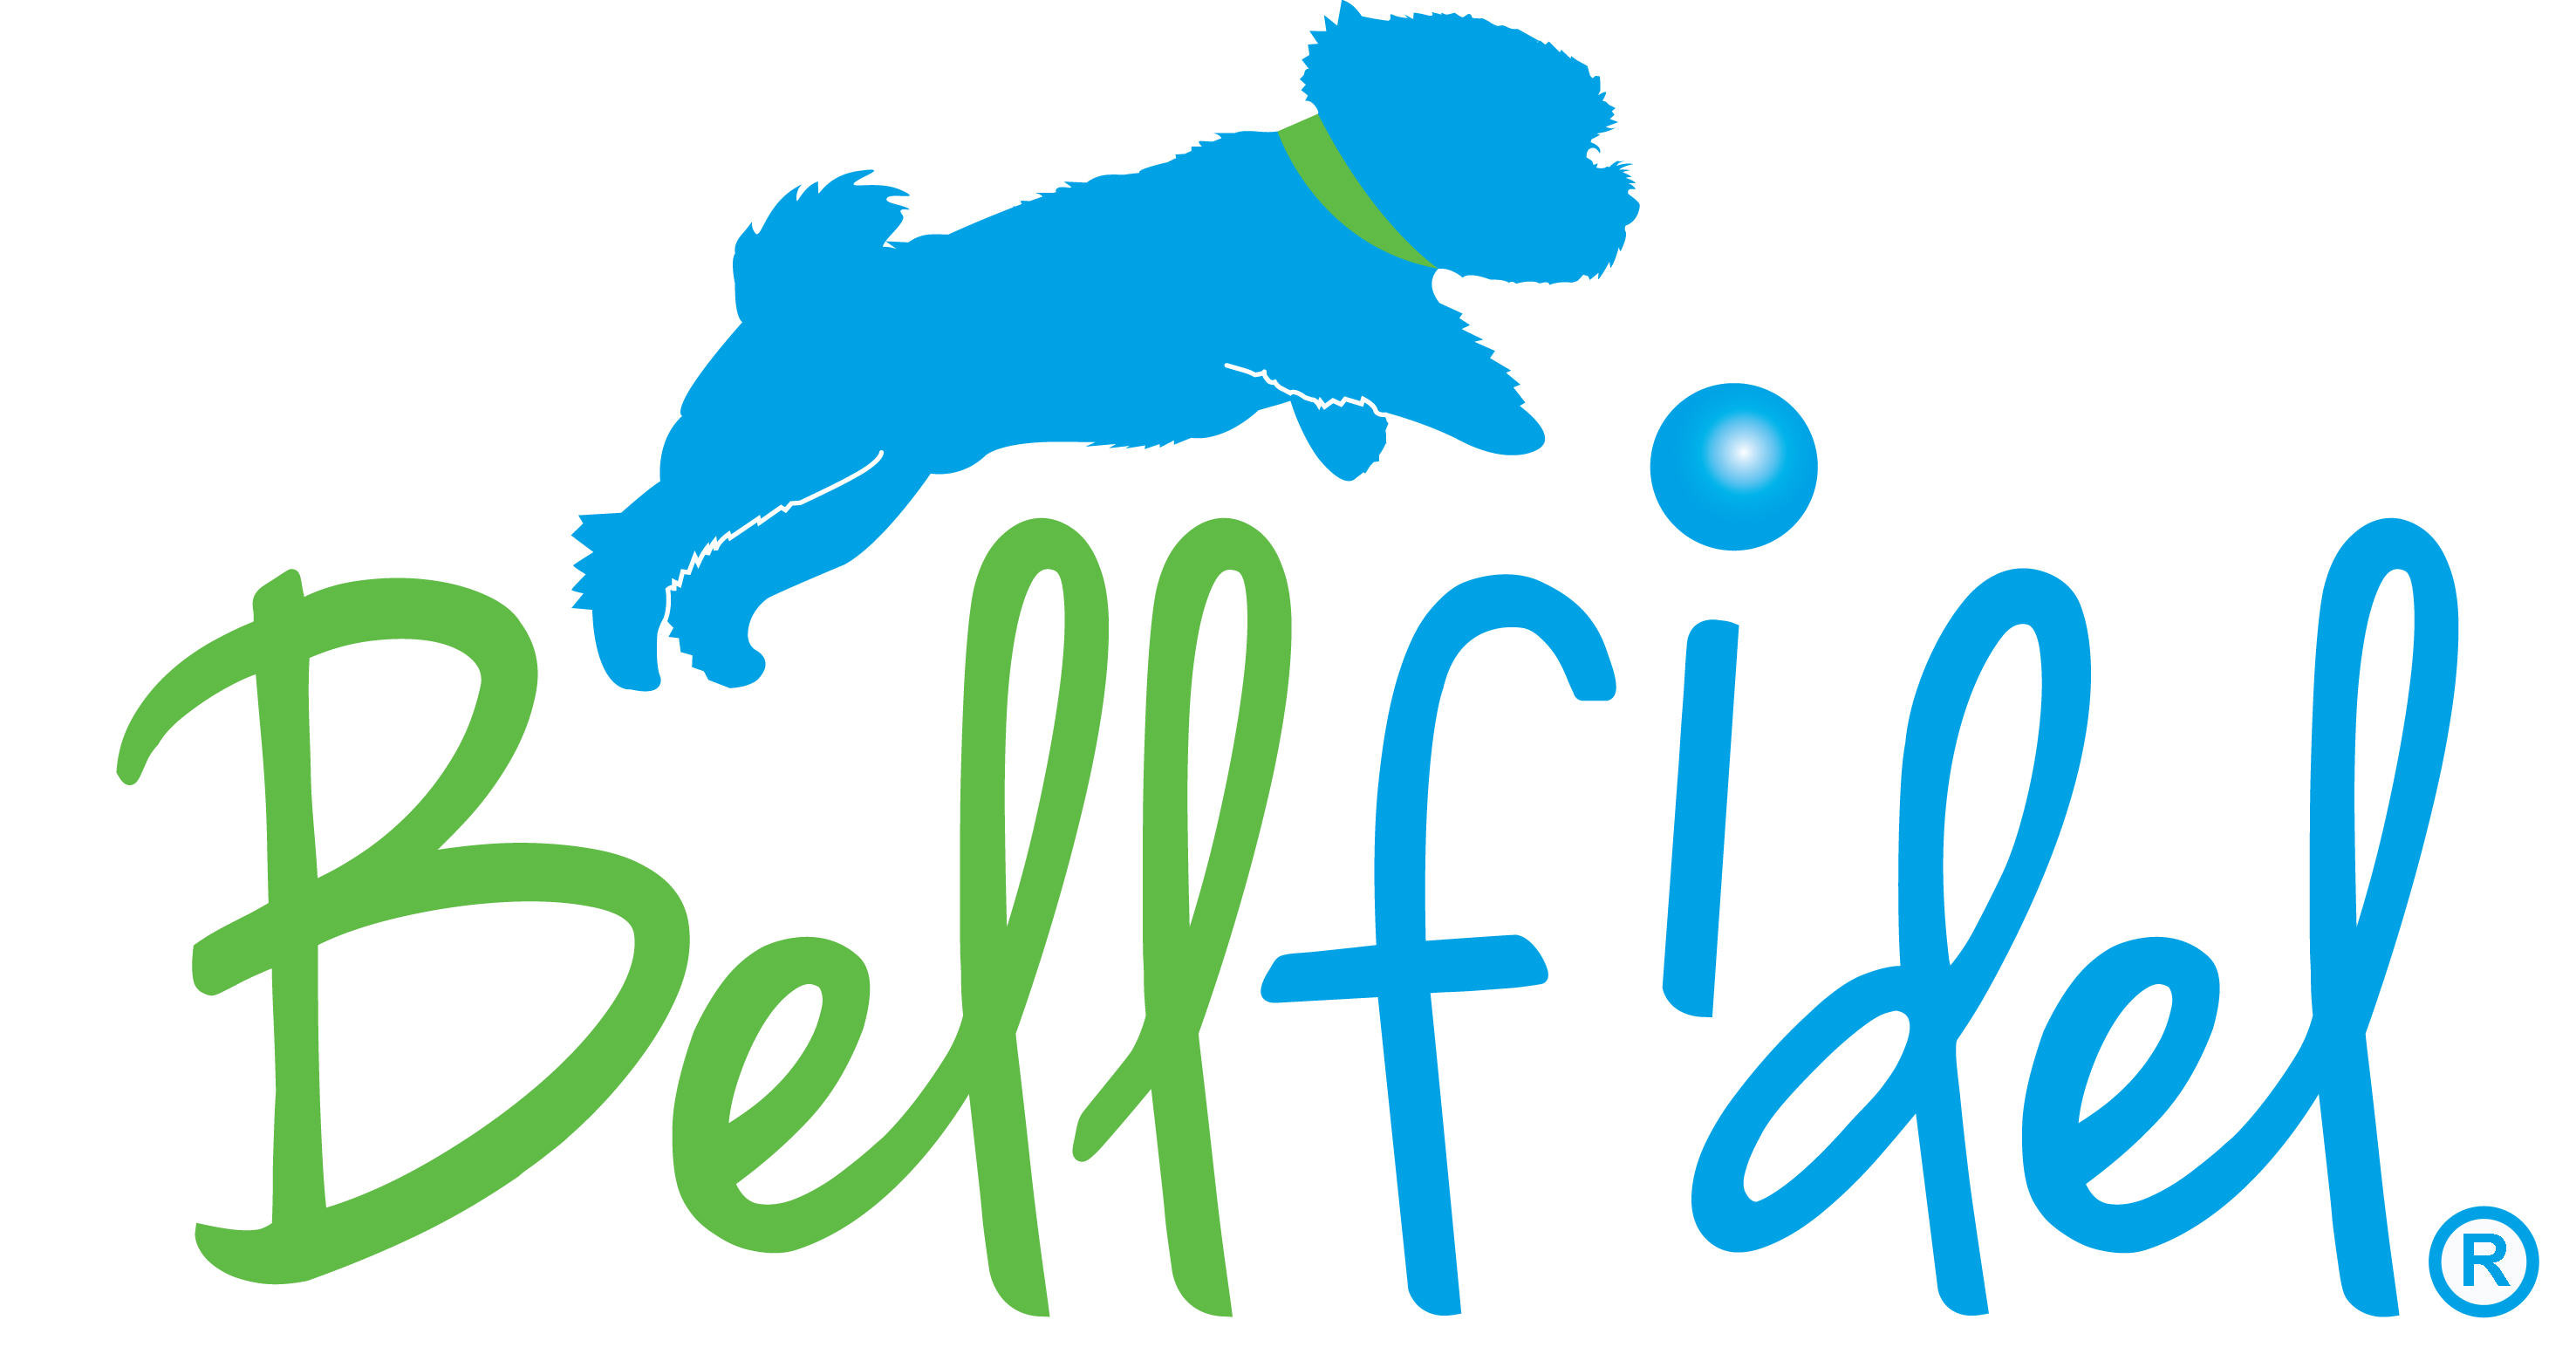 Bellfidel®